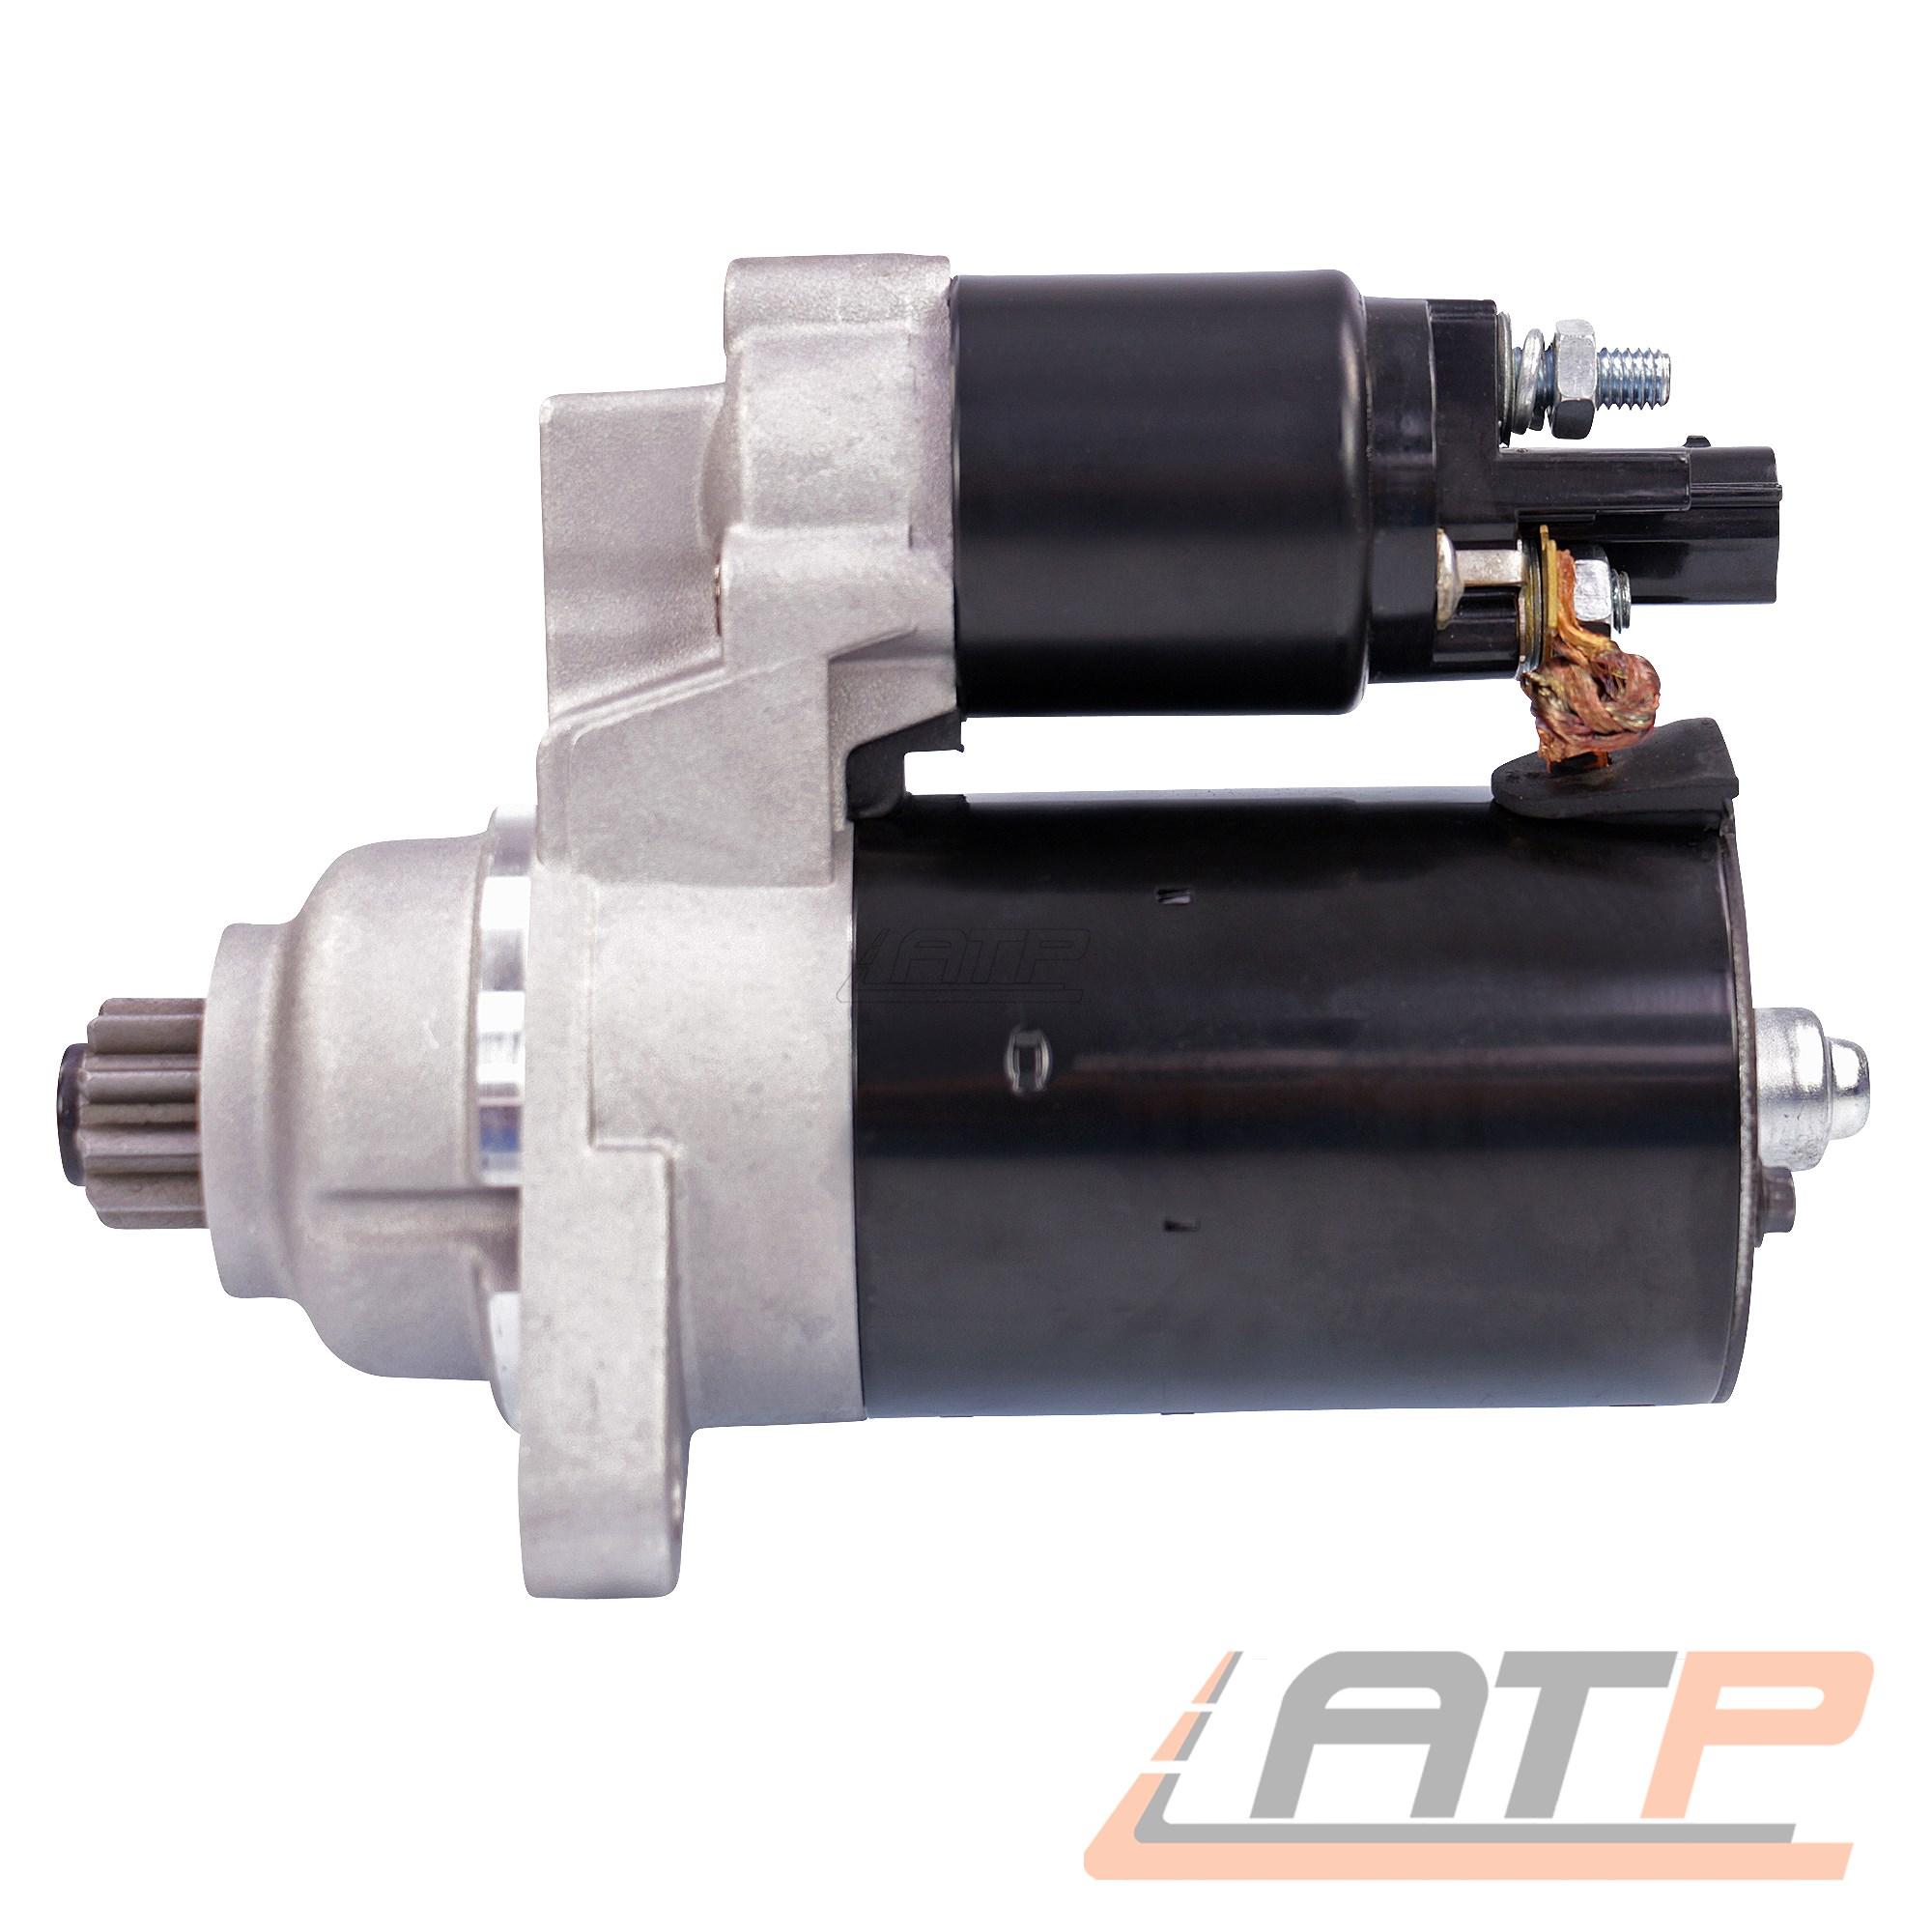 xl 5p 1.6 cordoba 6l 2.0 BJ 04-05 Leon 1p 1.6 Motor de arranque Starter 1 kw SEAT Altea